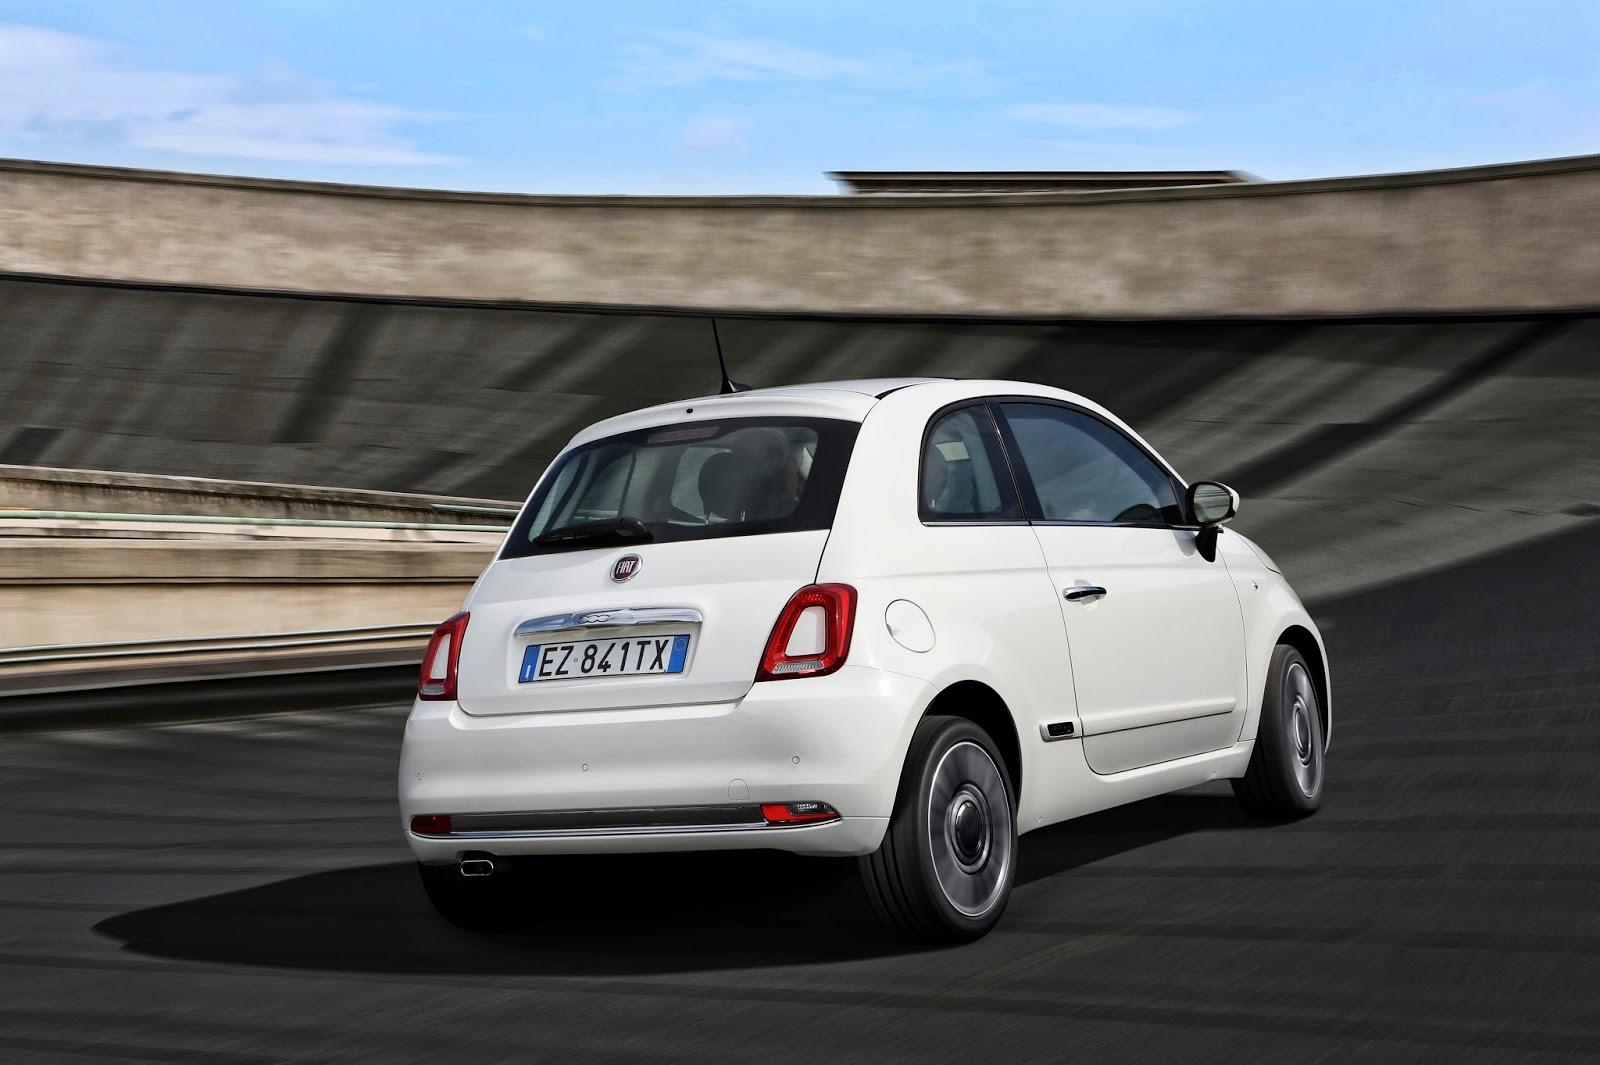 150703 FIAT Nuova 500 07 Η άφιξη του νέου Fiat 500 είναι γεγονός